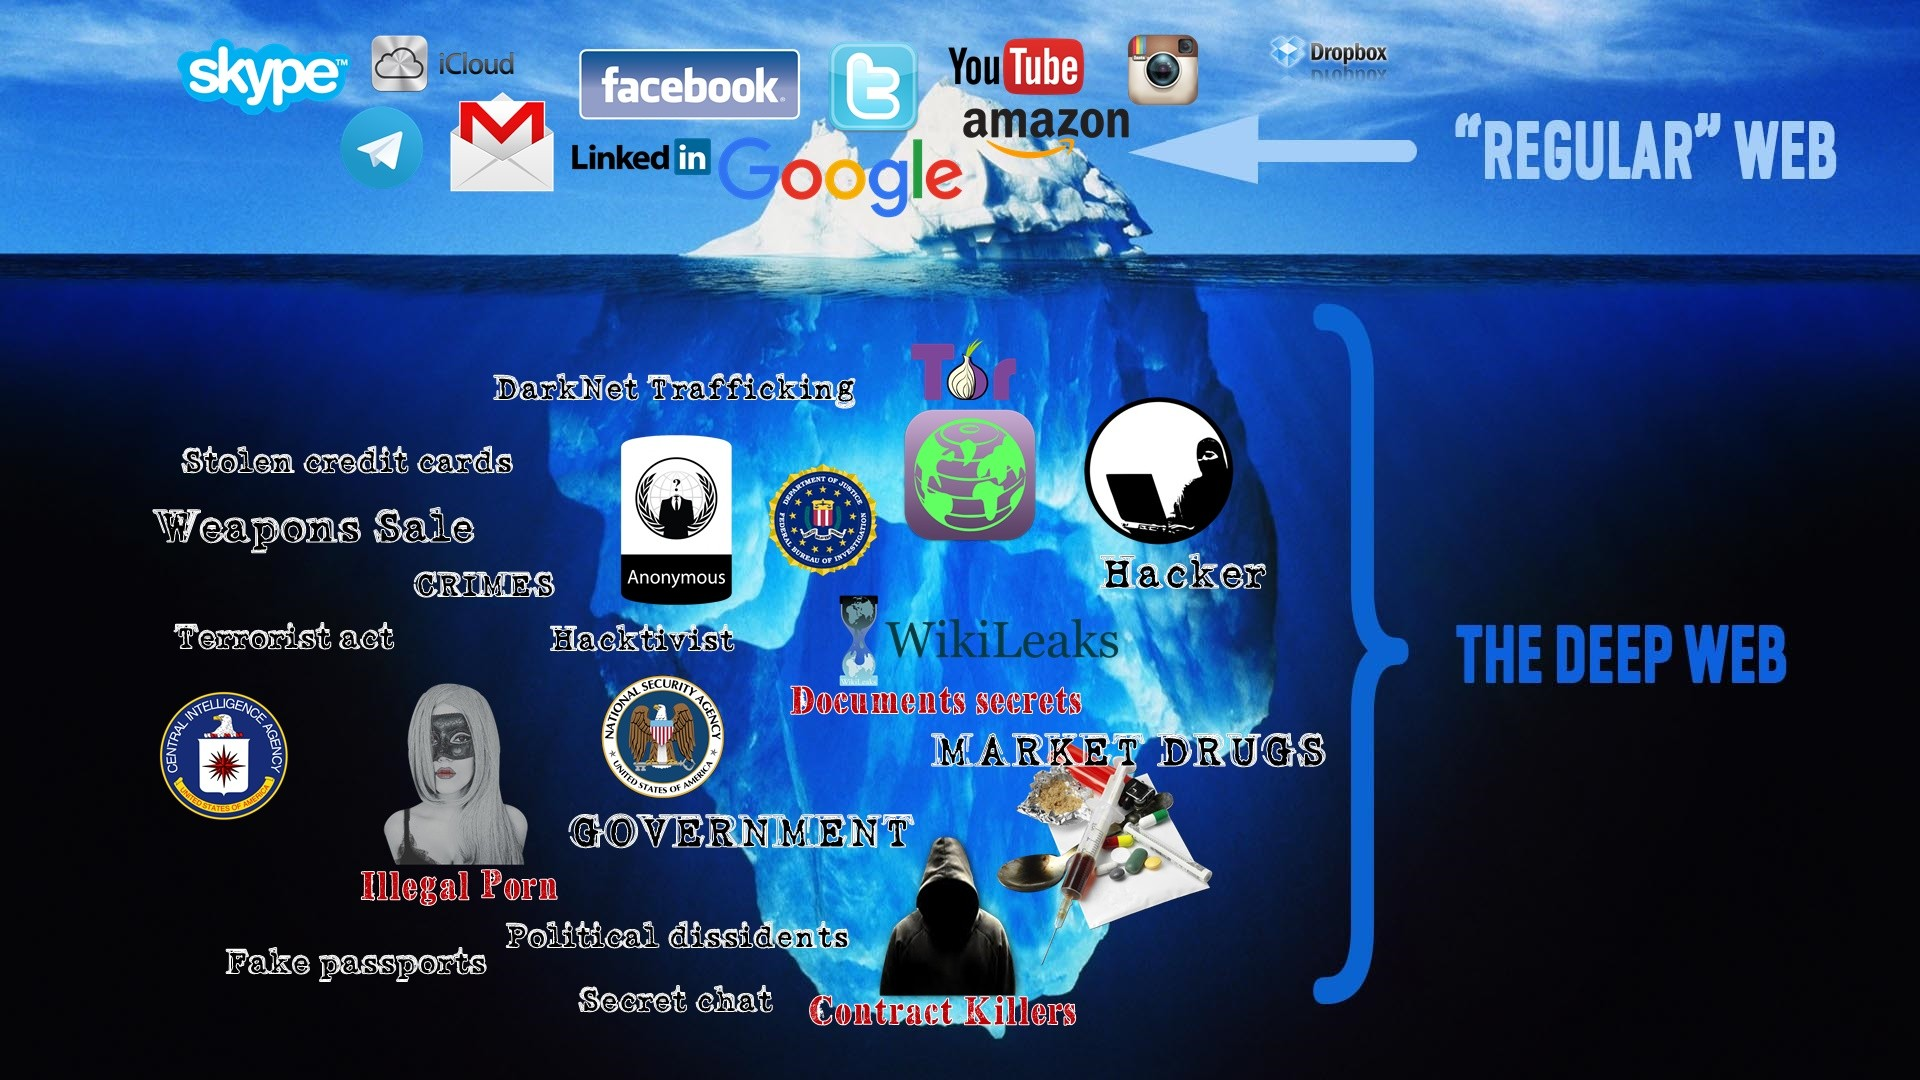 General 1920x1080 deep web internet dark dangerous technology hackers